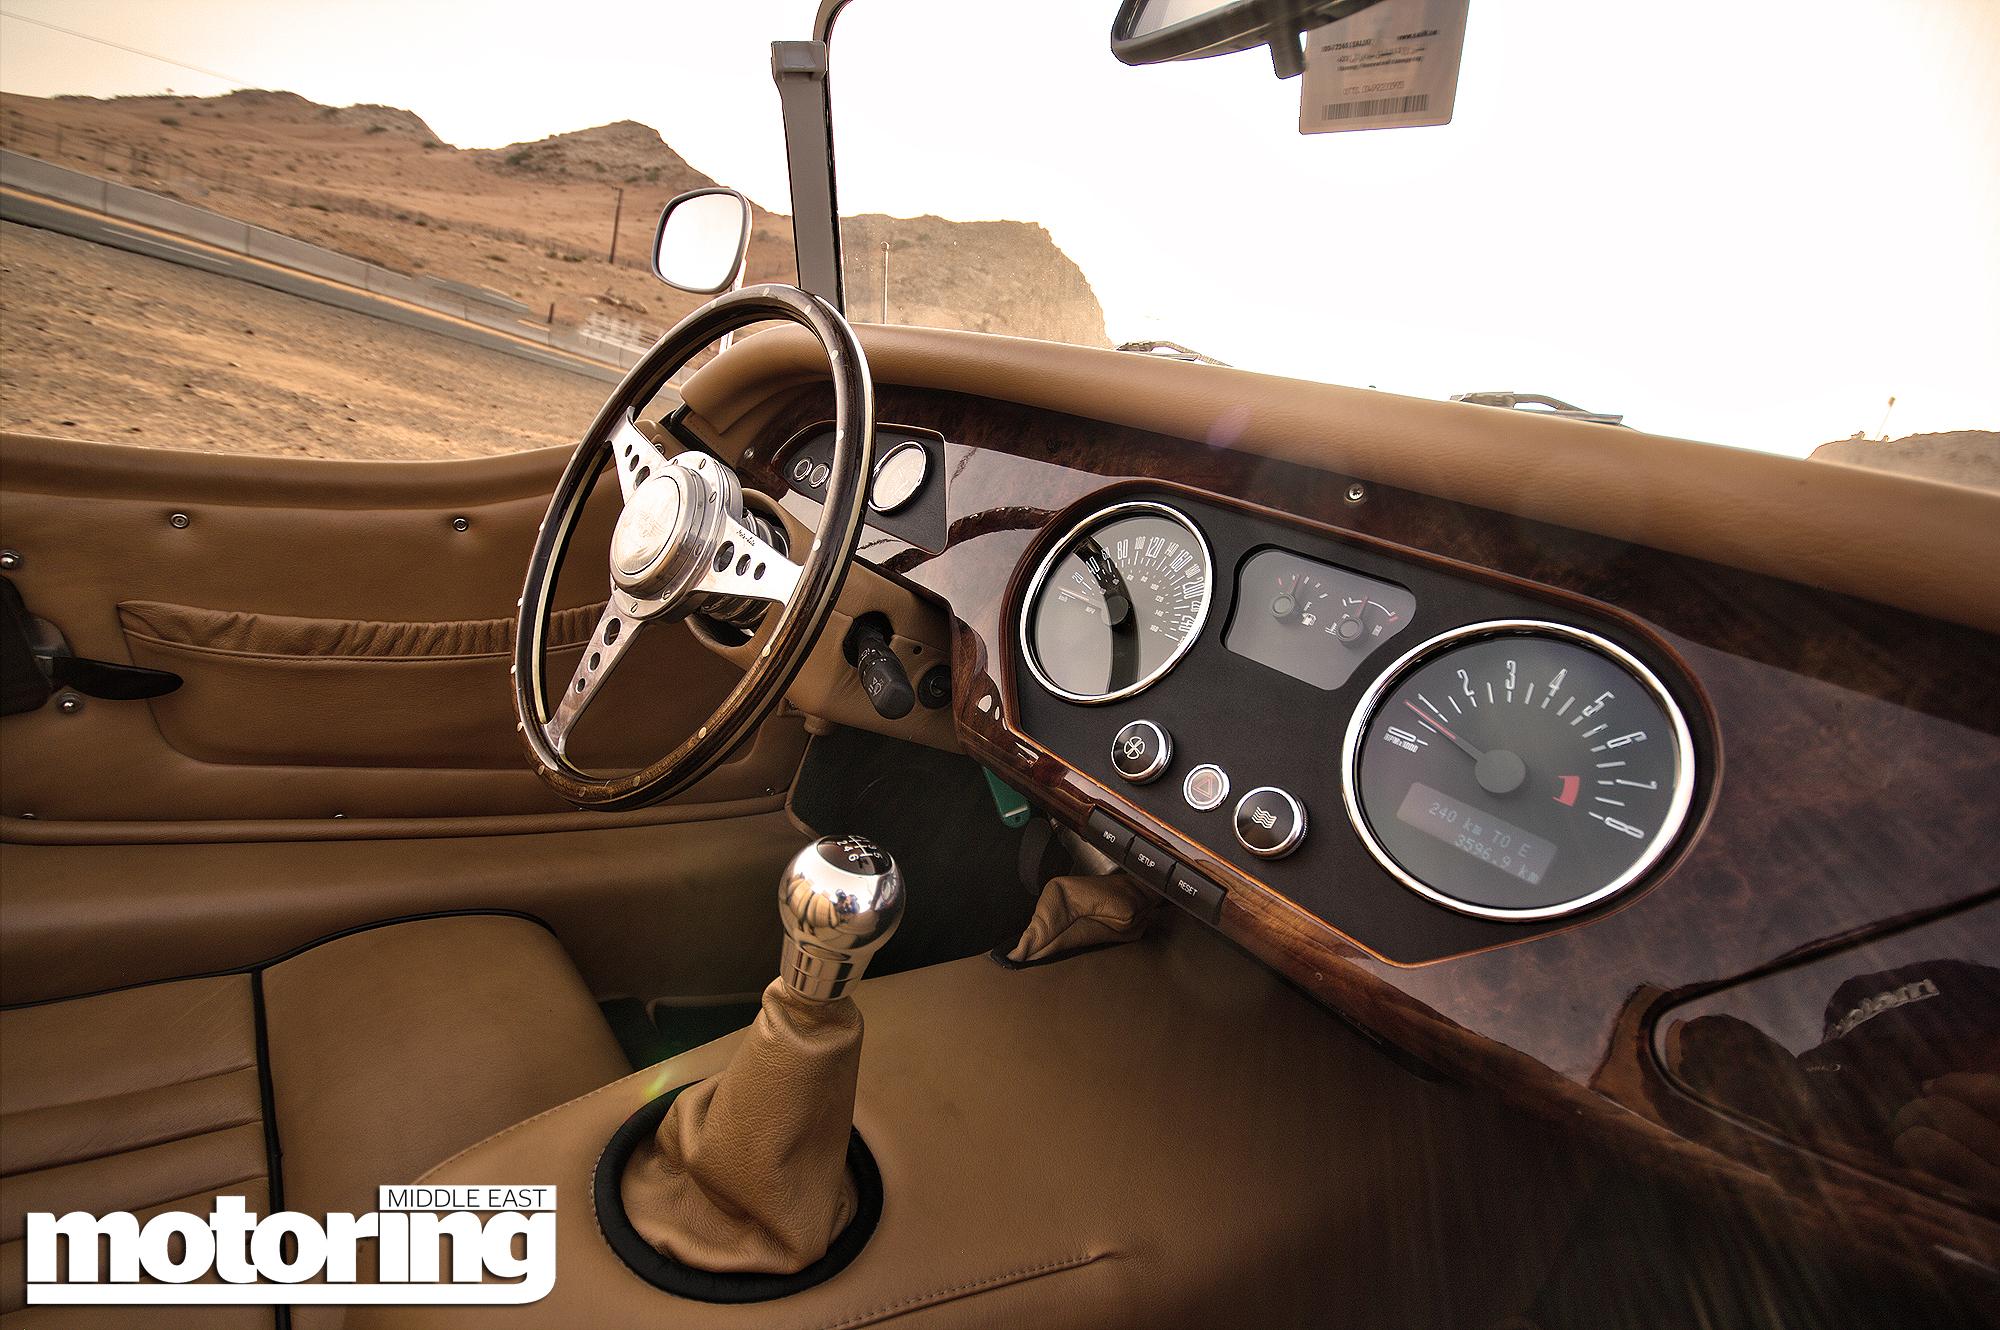 Morgan Roadster with Mustang power – video reviewMotoring